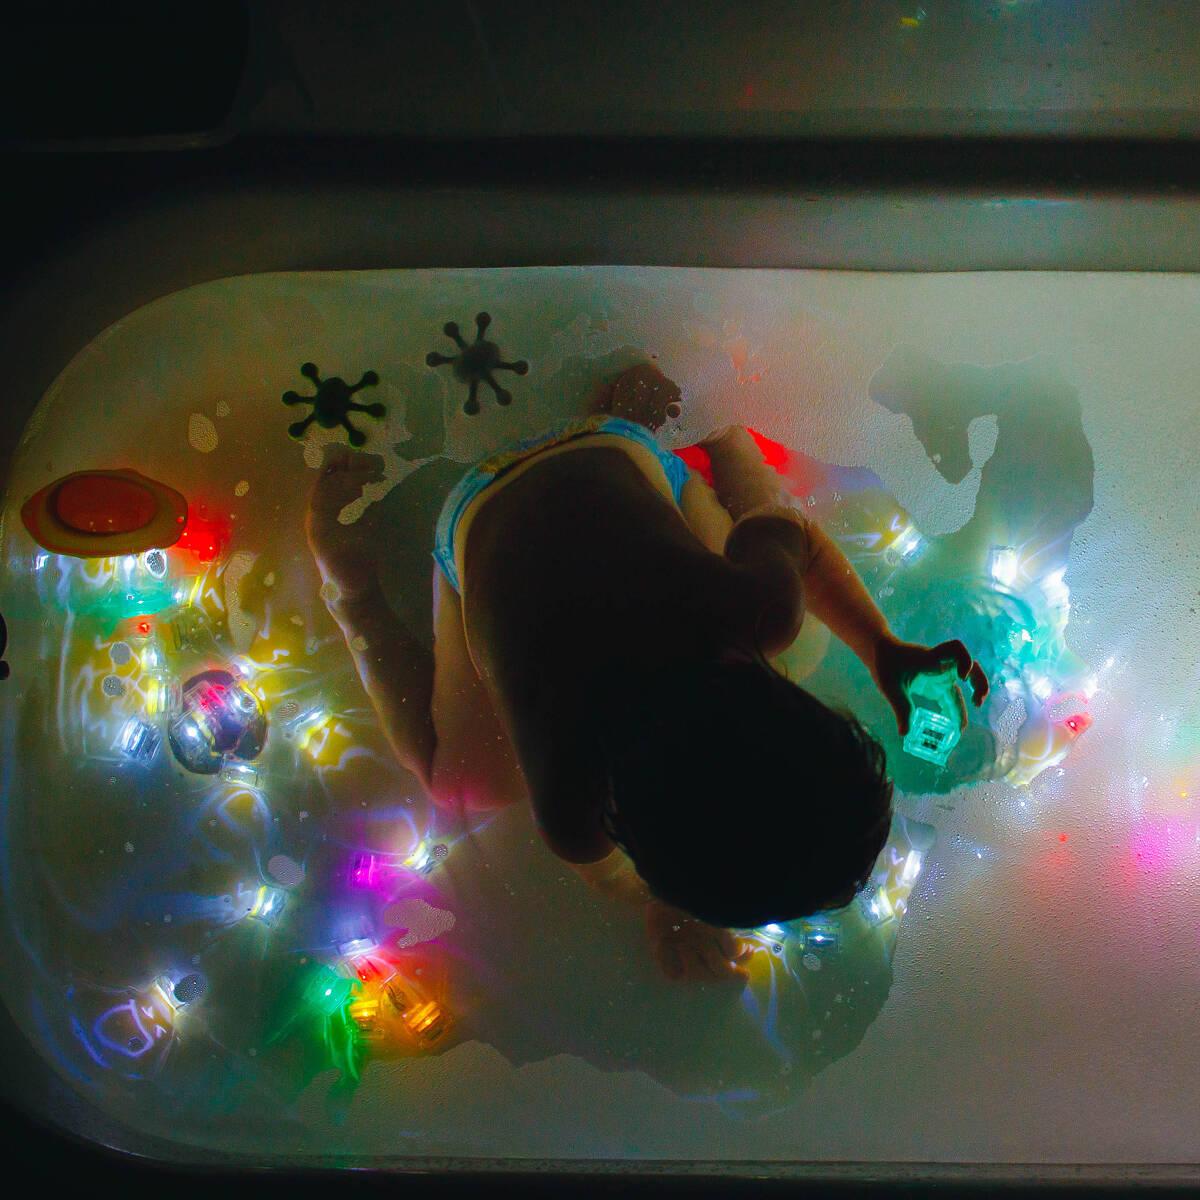 Glowing Bathtime Pals